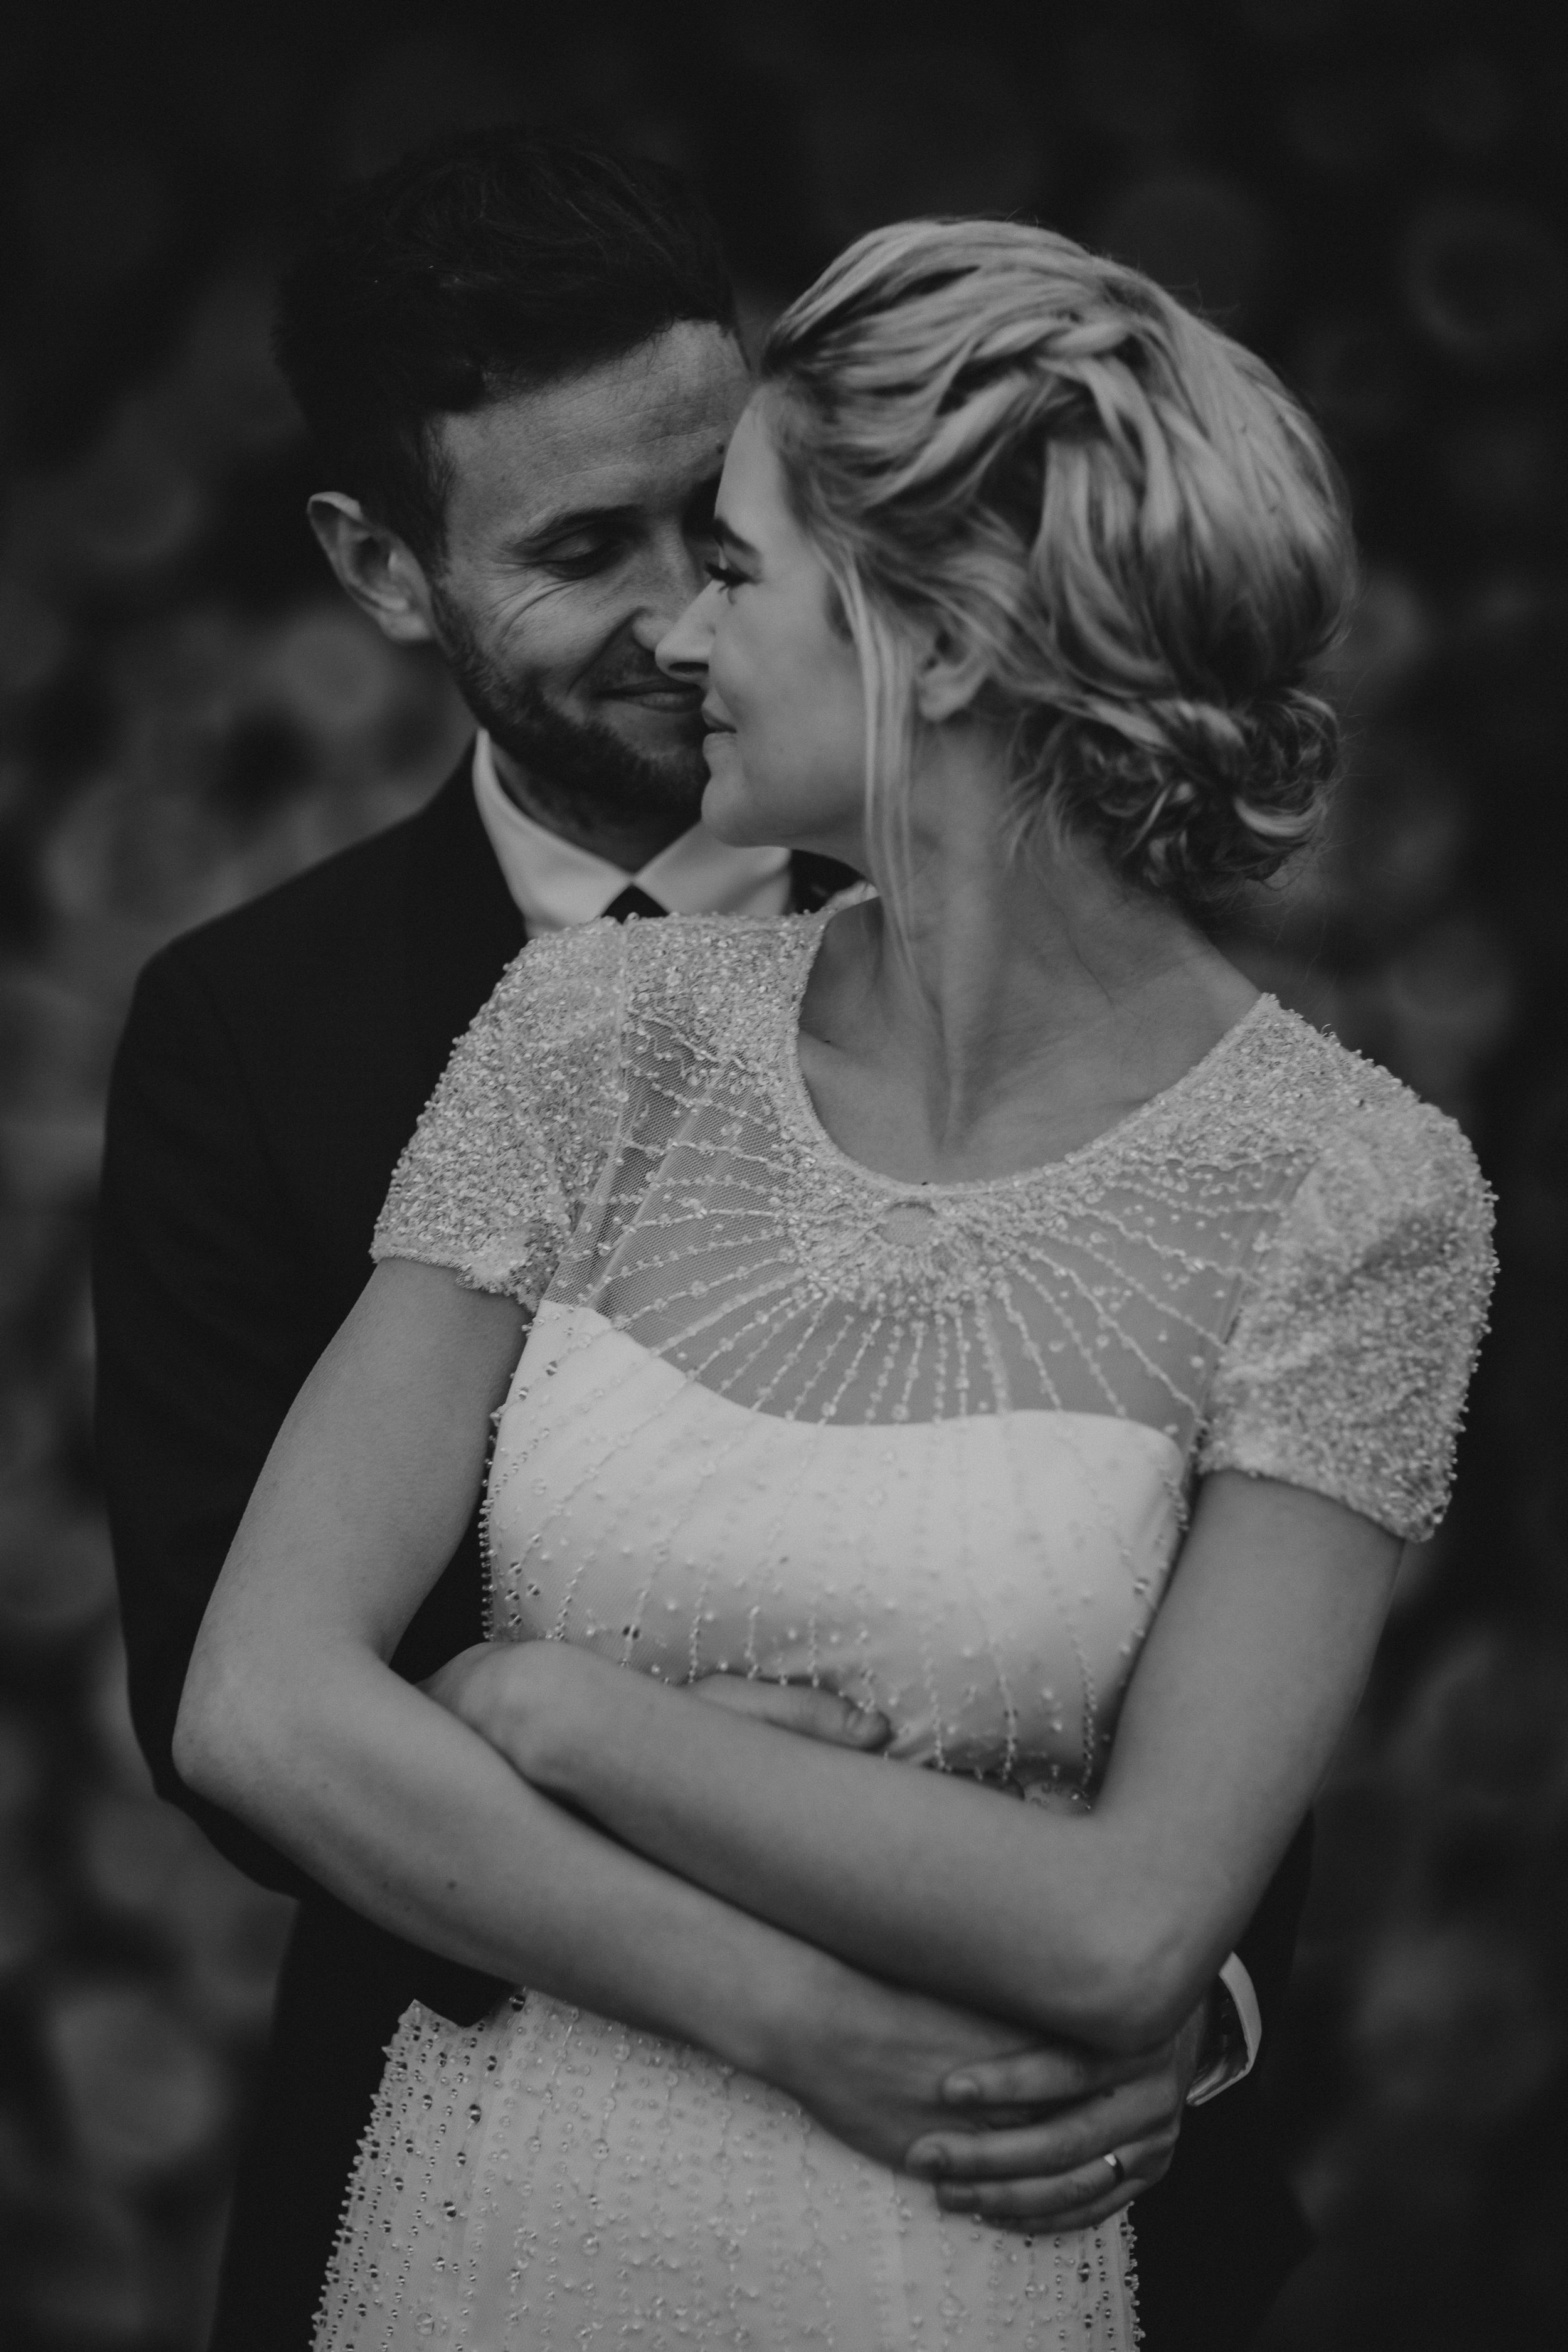 London_wedding_photographer_gione_da_silva_carelle_paul181.jpg